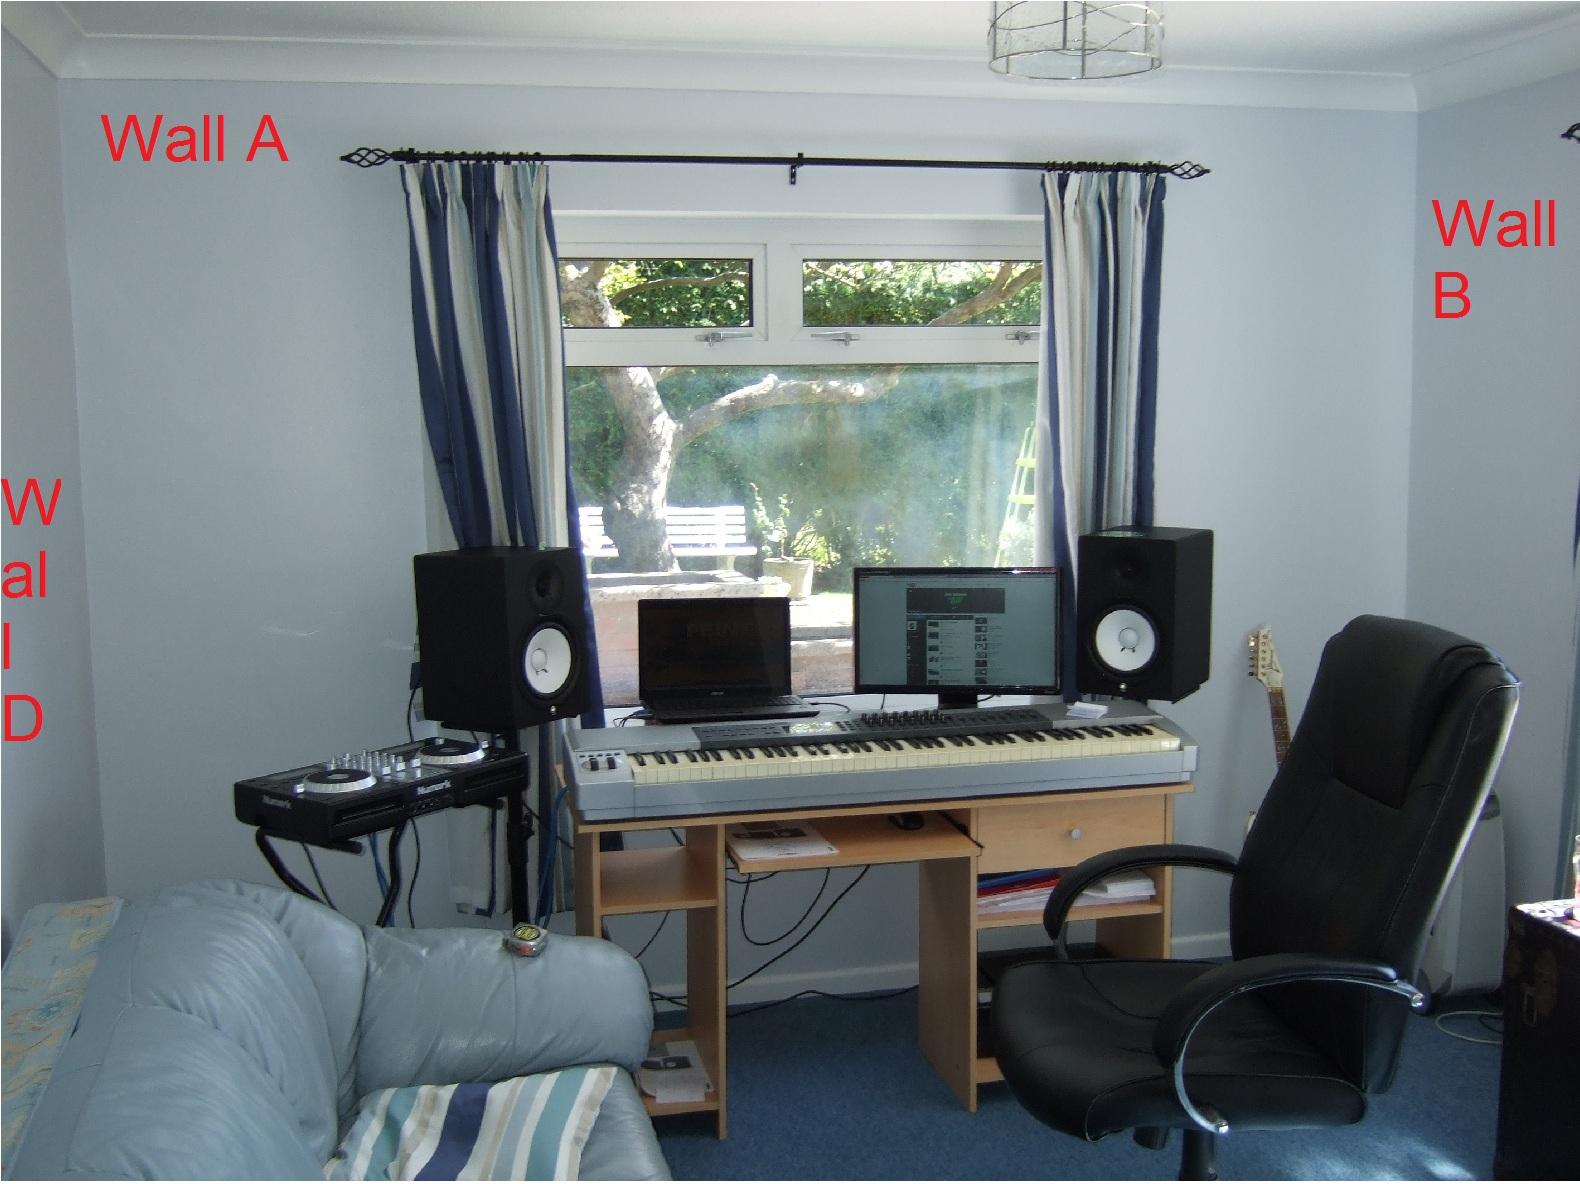 Room Setup Bass Trap Help Gearslutz Pro Audio Community